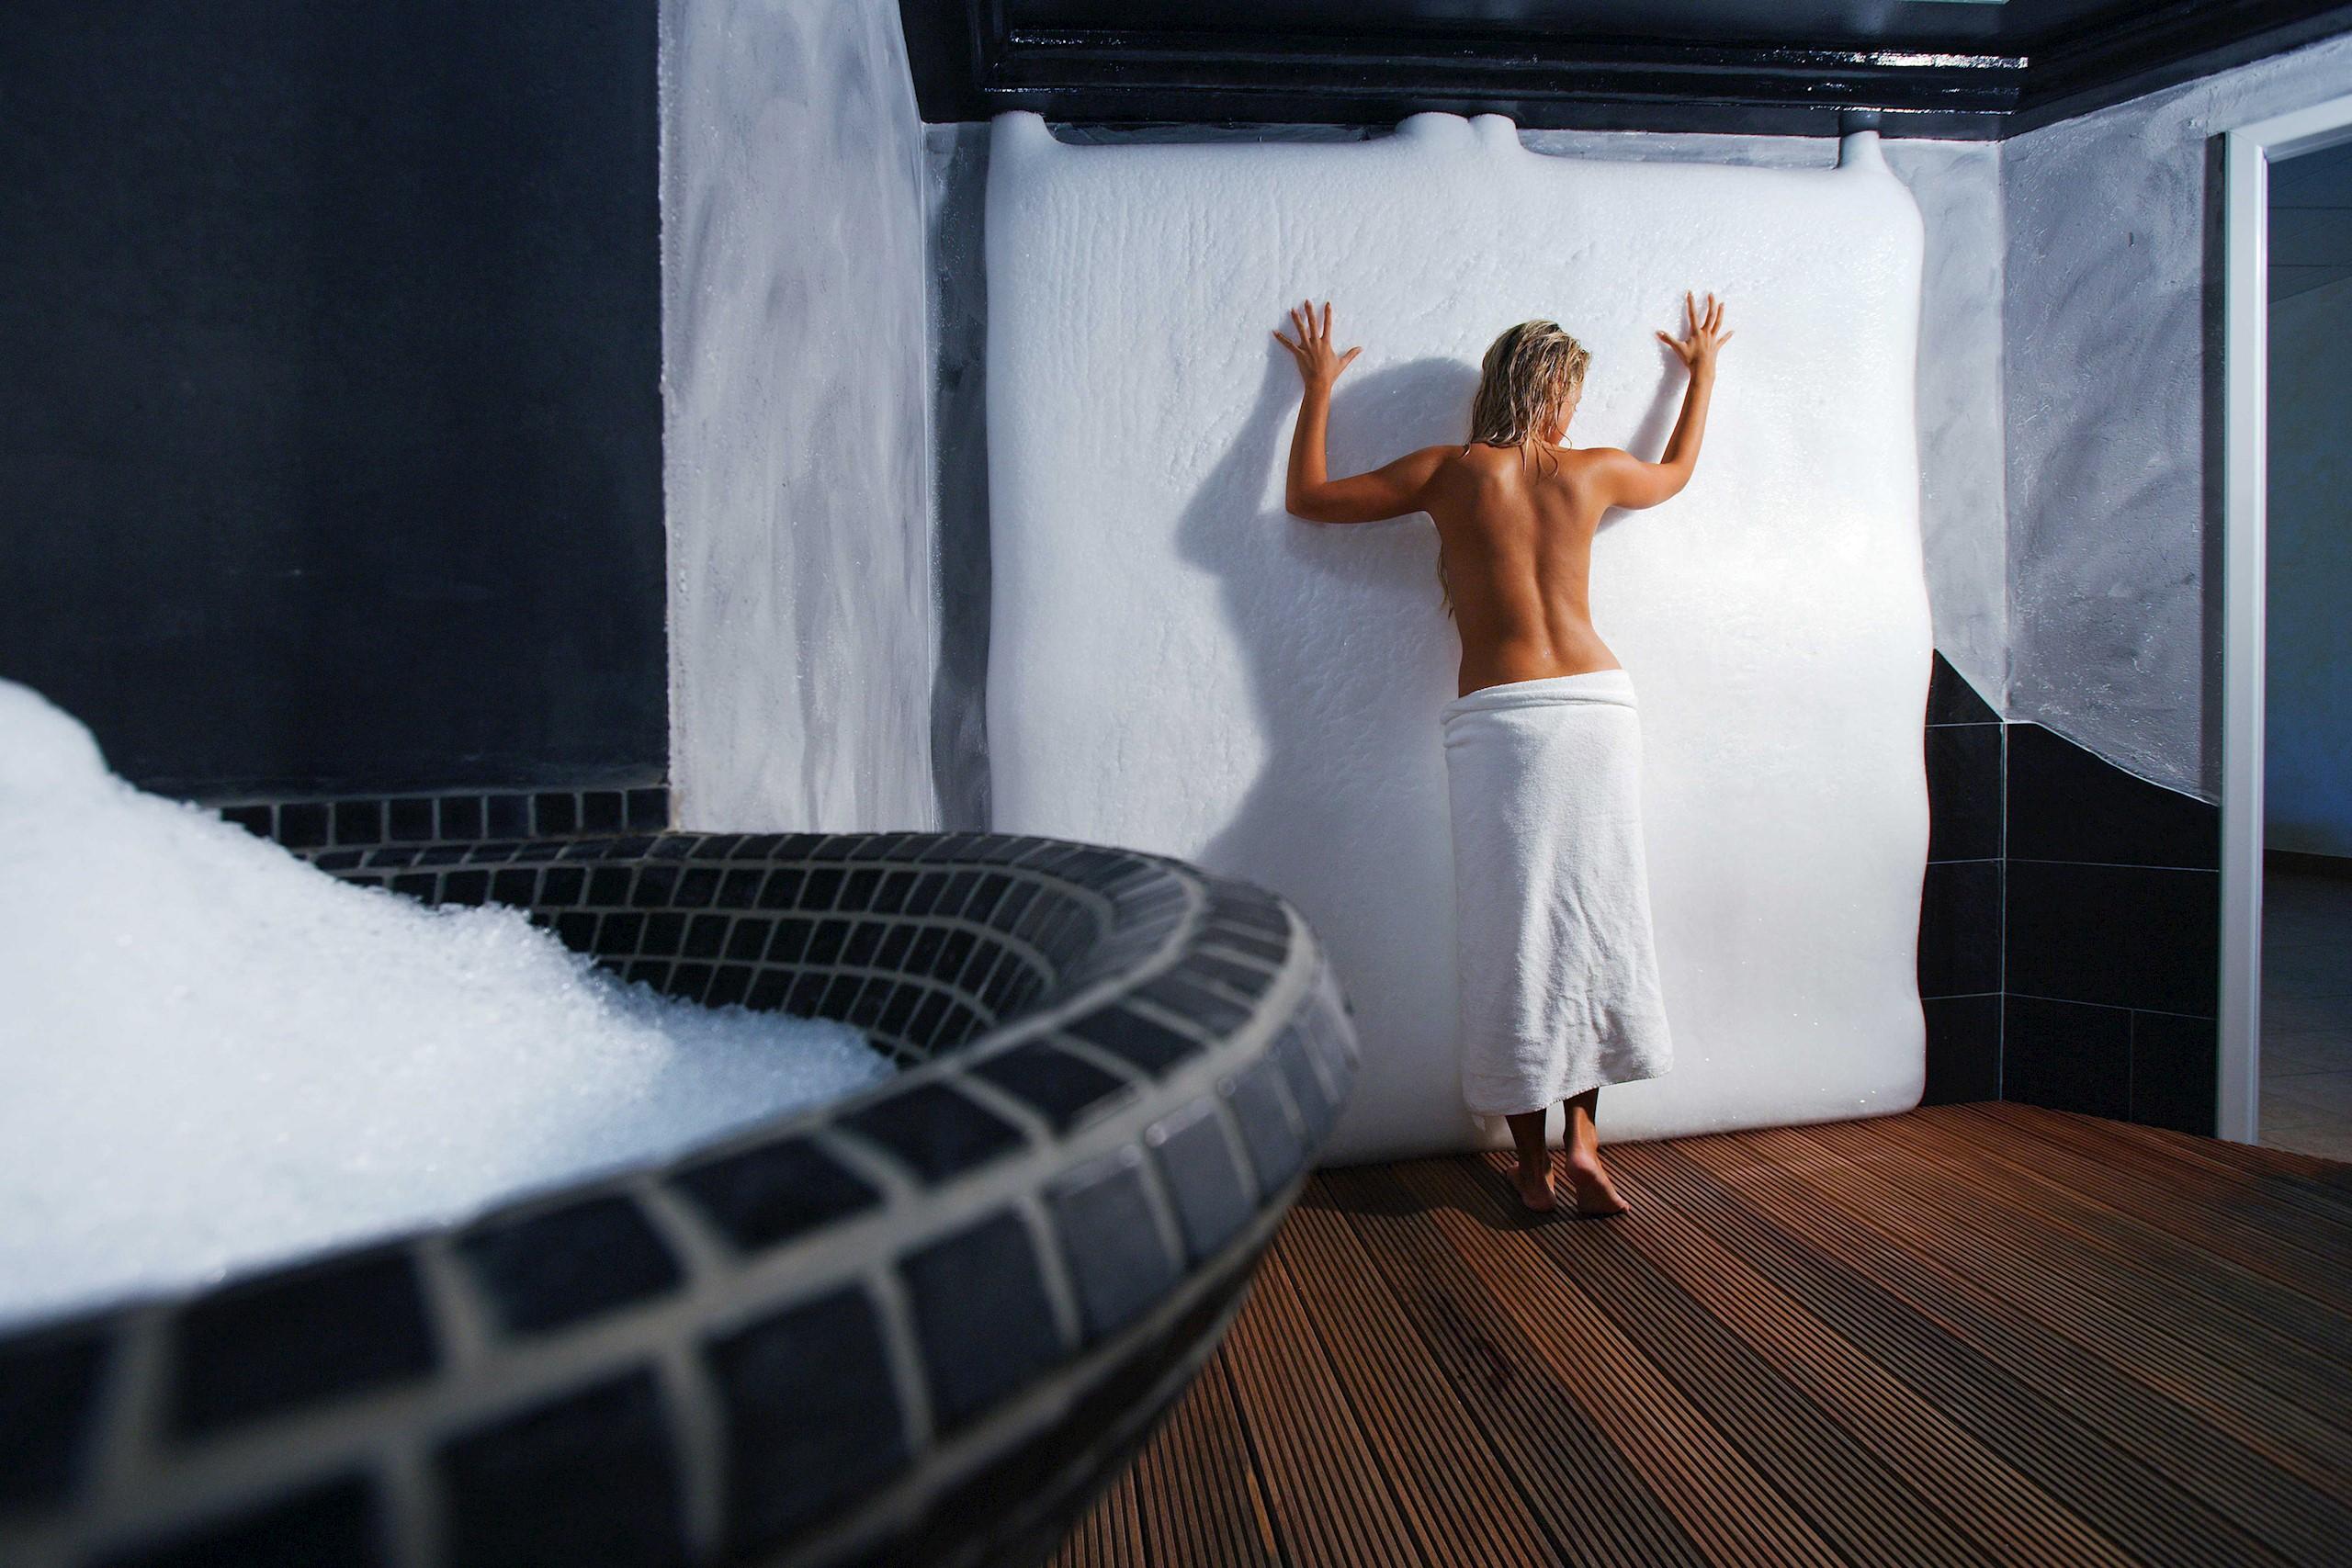 sauna-park-ice-cave-ice-wall-woman